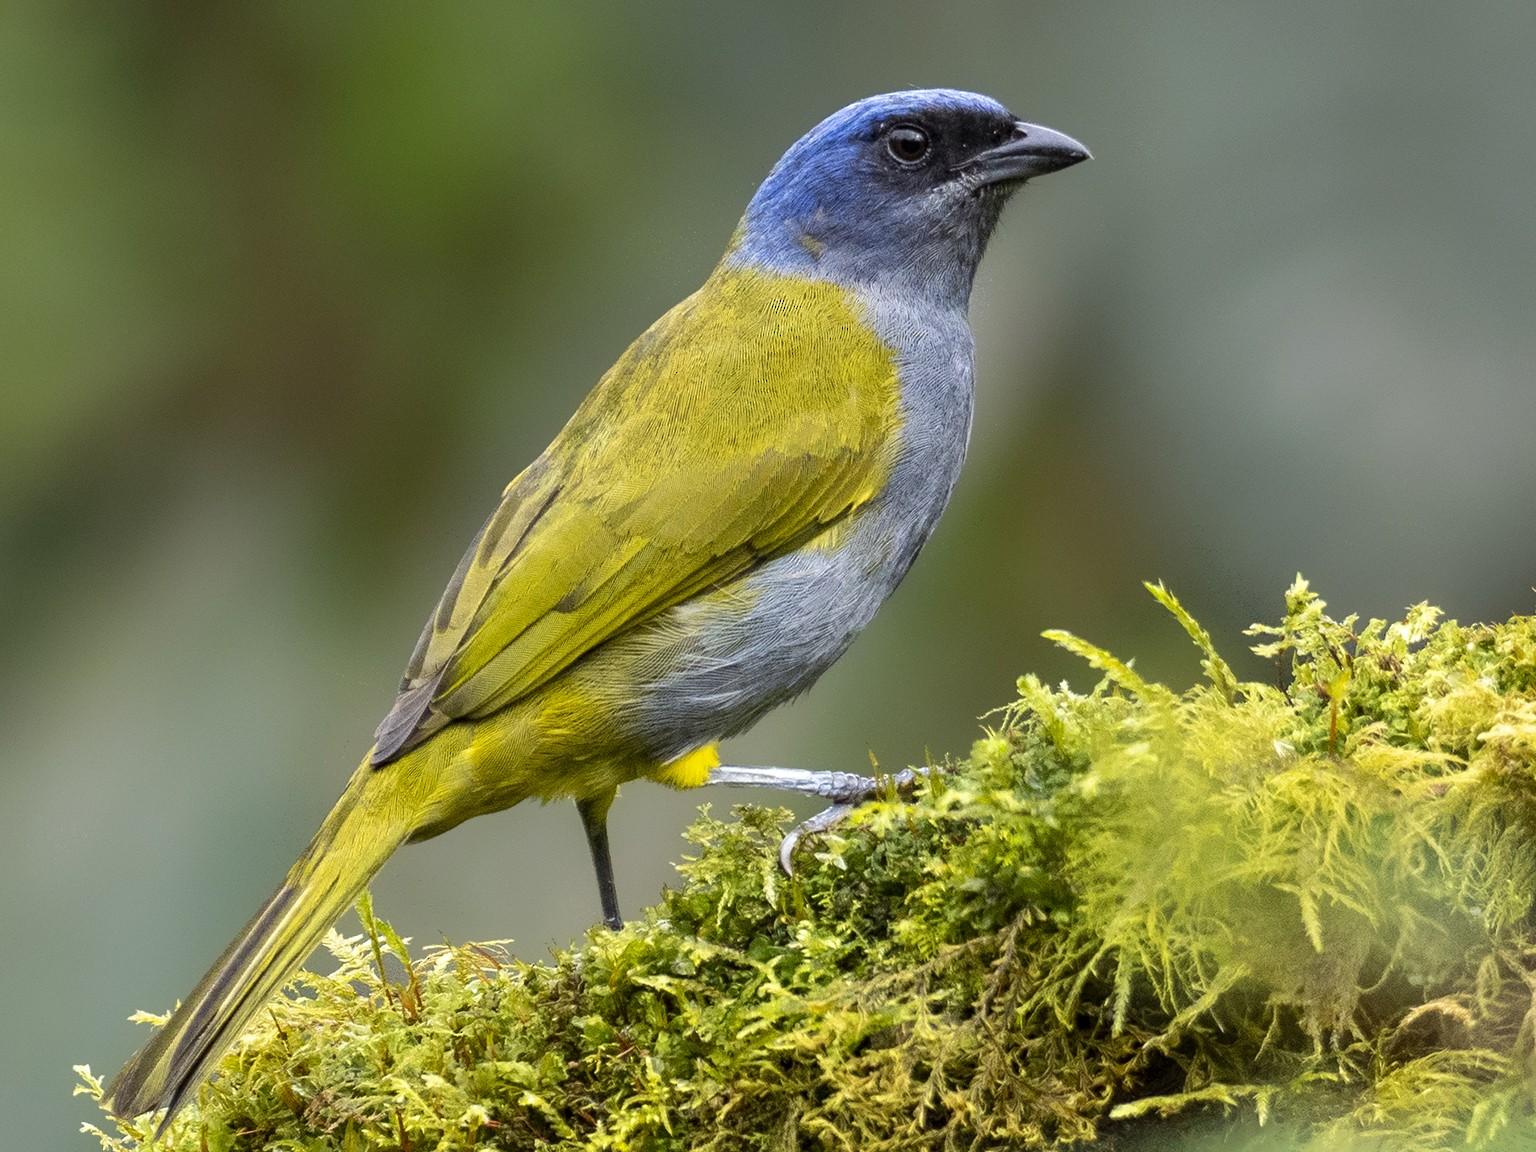 Blue-capped Tanager - Andres Vasquez Noboa - Tropical Birding Tours